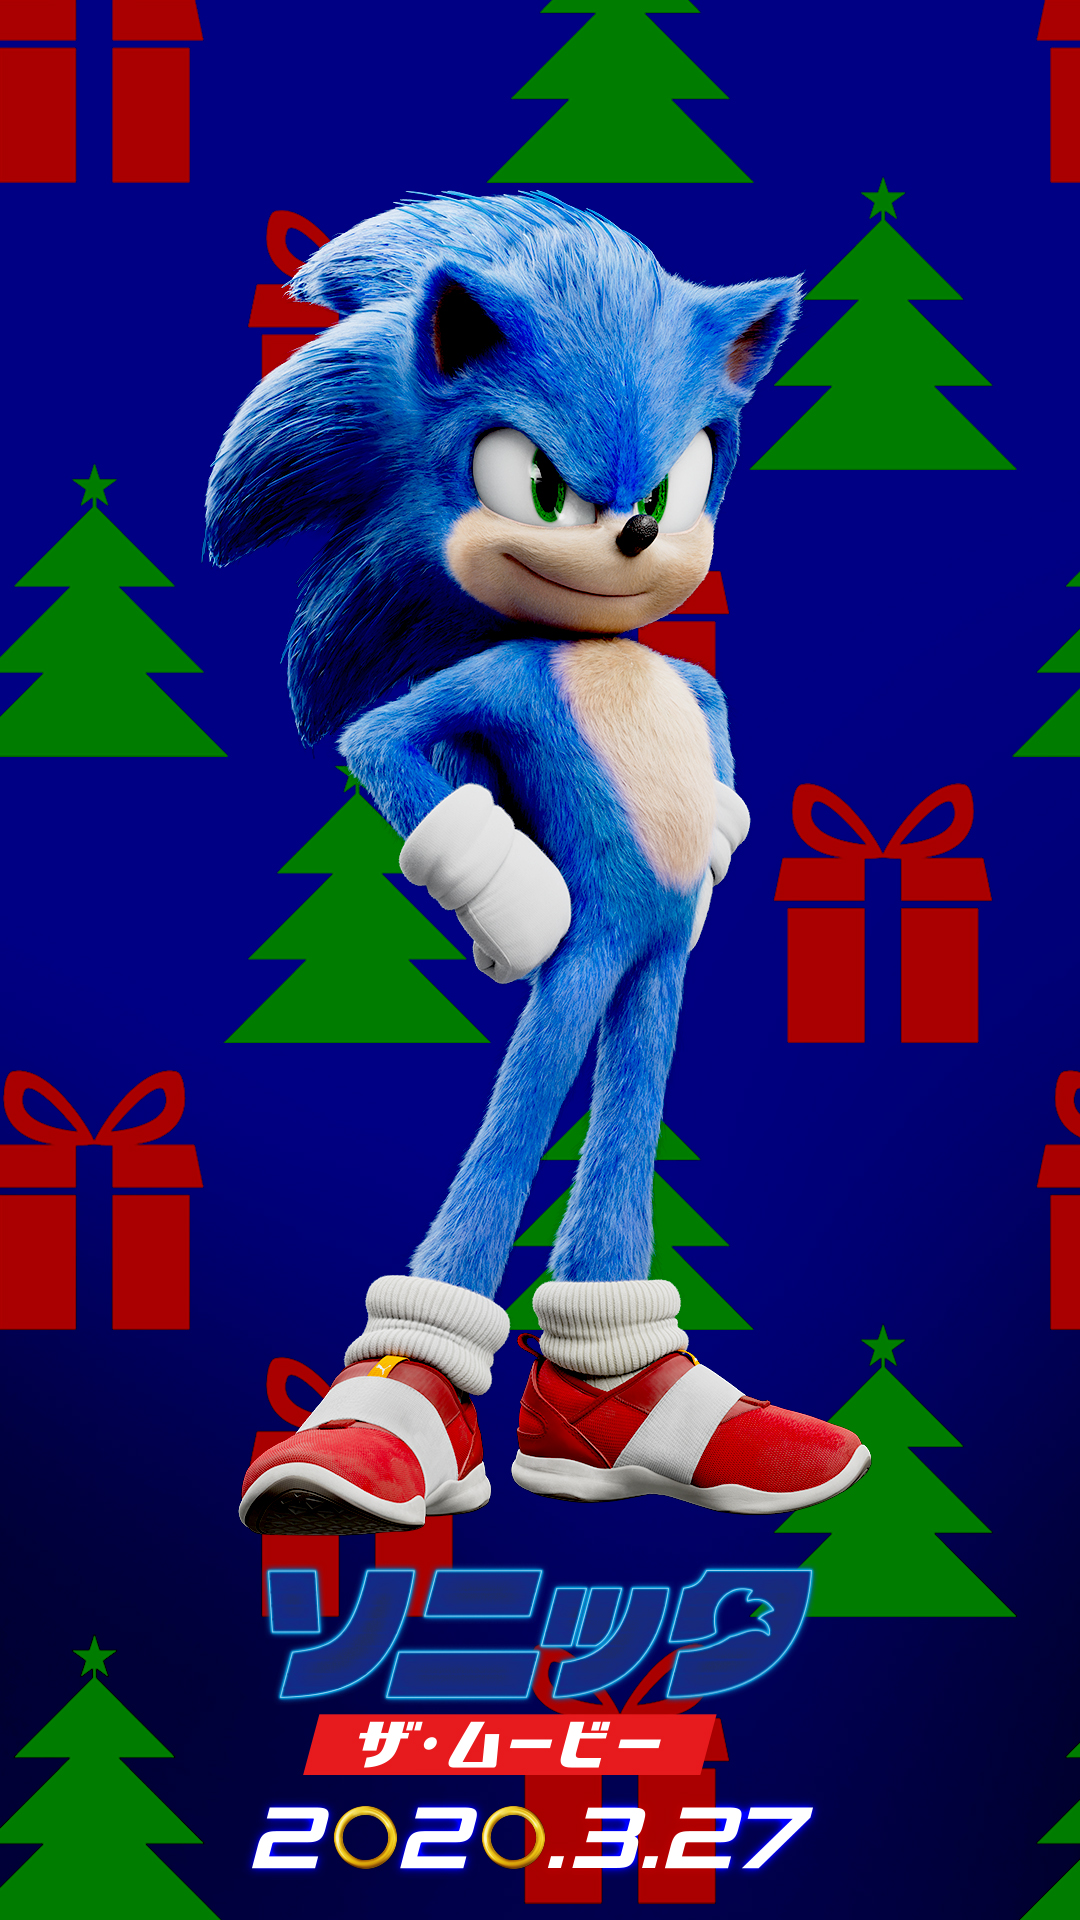 Sonic Christmas 2020 Sonic the Hedgehog (2020)   Page 57   Blu ray Forum